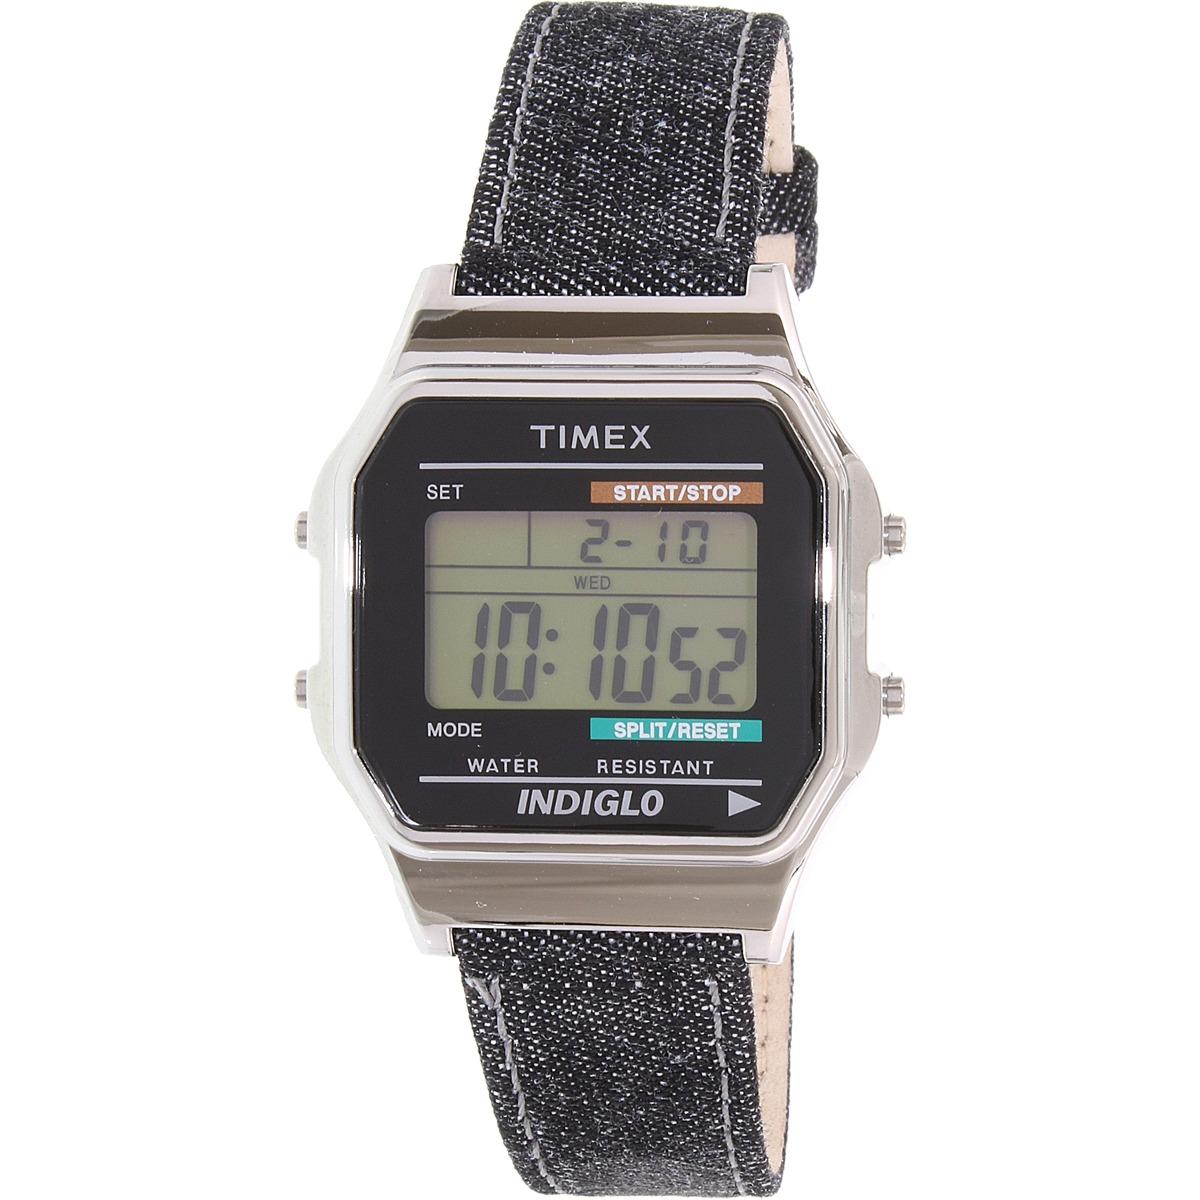 824ba2d9d562 Reloj Timex Para Hombres Tw2p77100 Cuero Azul -   1